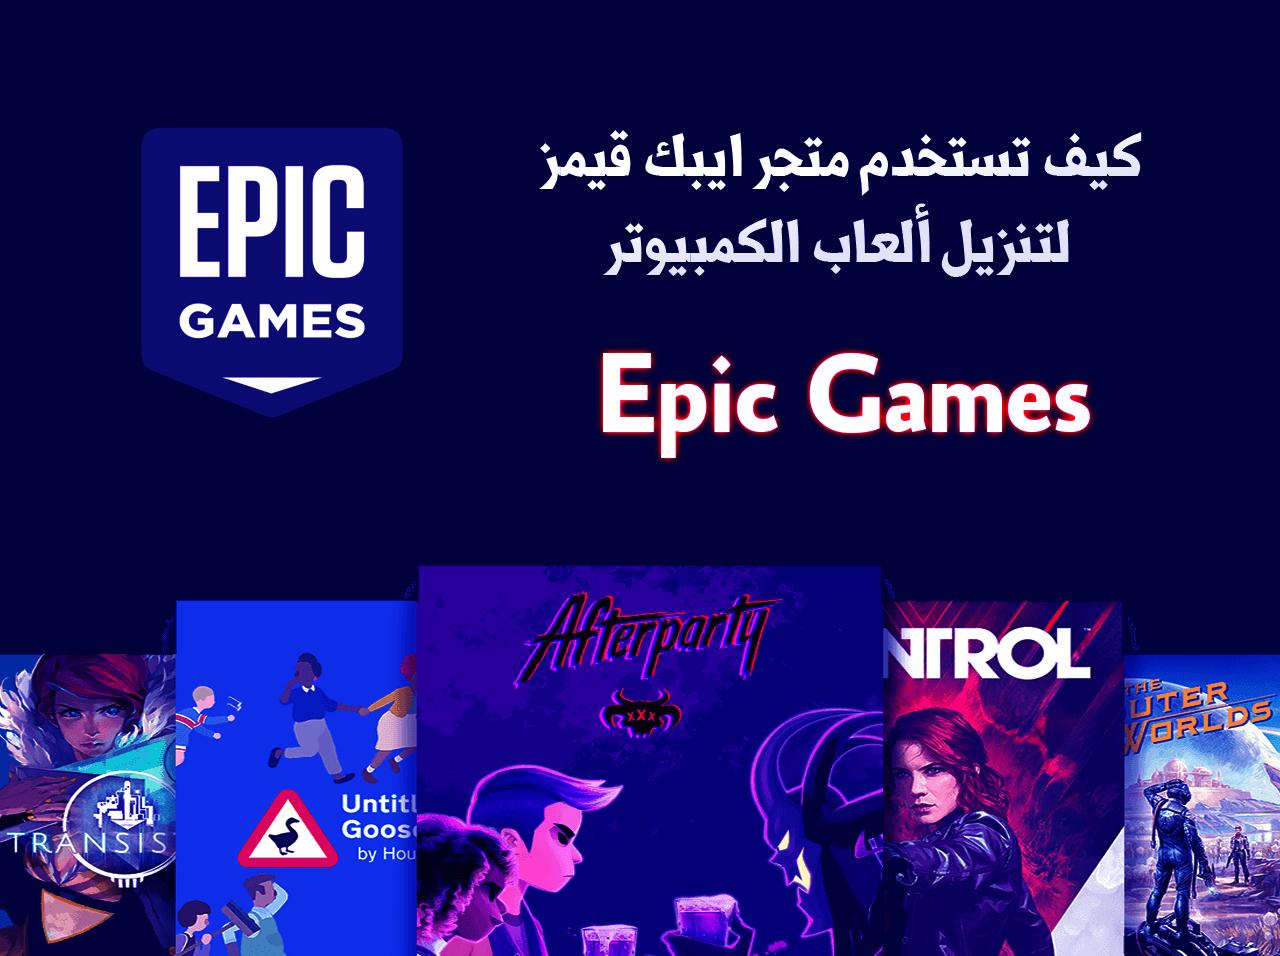 تحميل ايبك قيمز Epic Games مشغل الالعاب للاندرويد والكمبيوتر